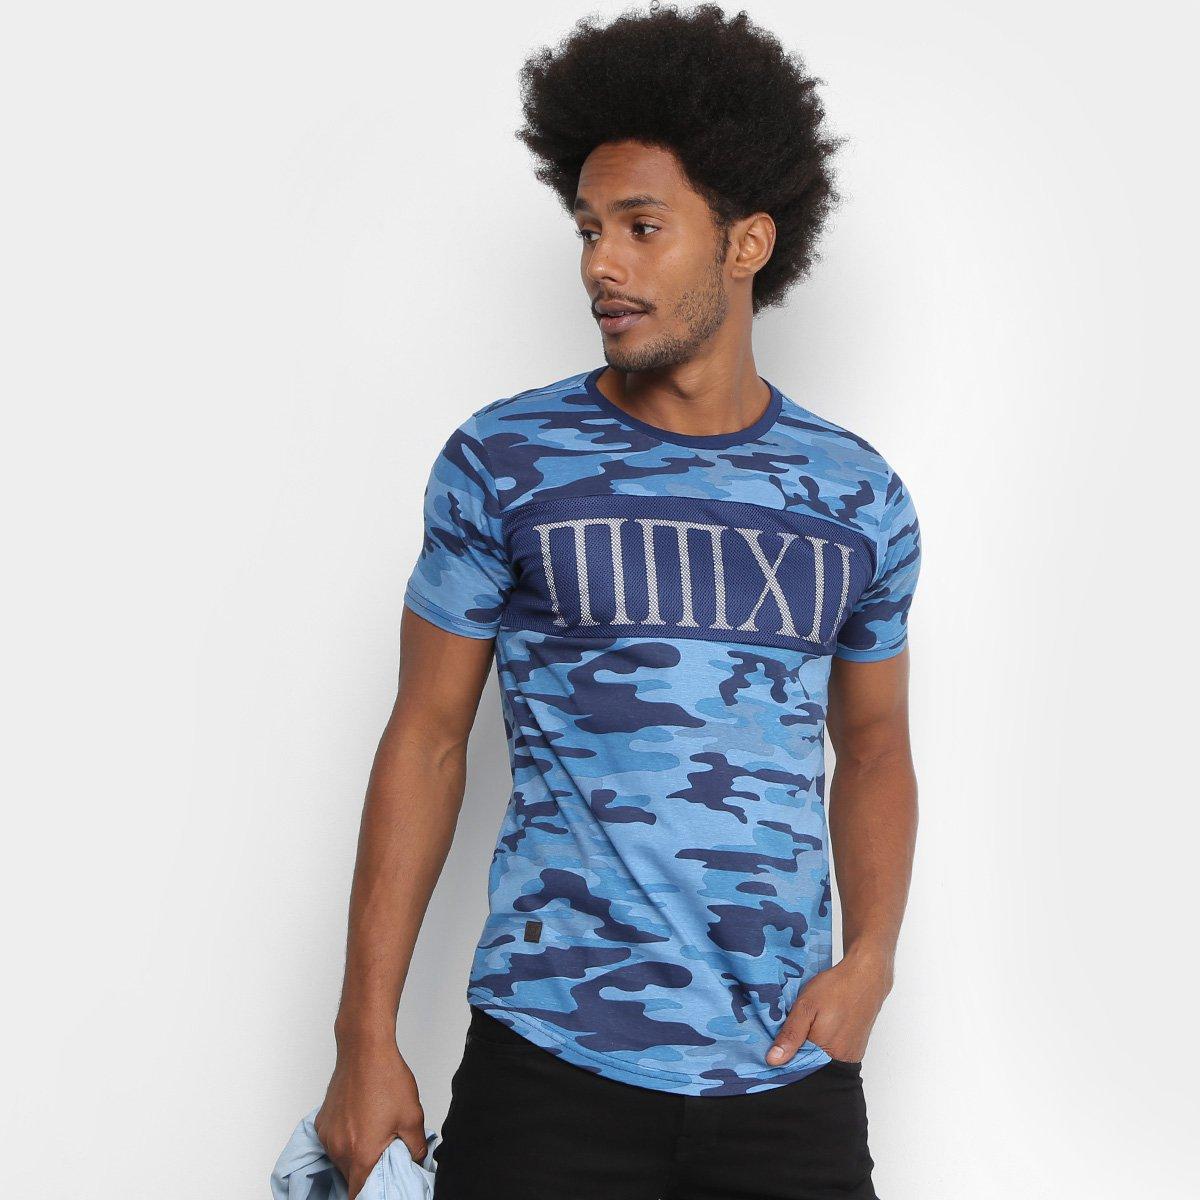 Camiseta Overcore Camuflada Tela Masculina - Compre Agora  b9c897194bf9e